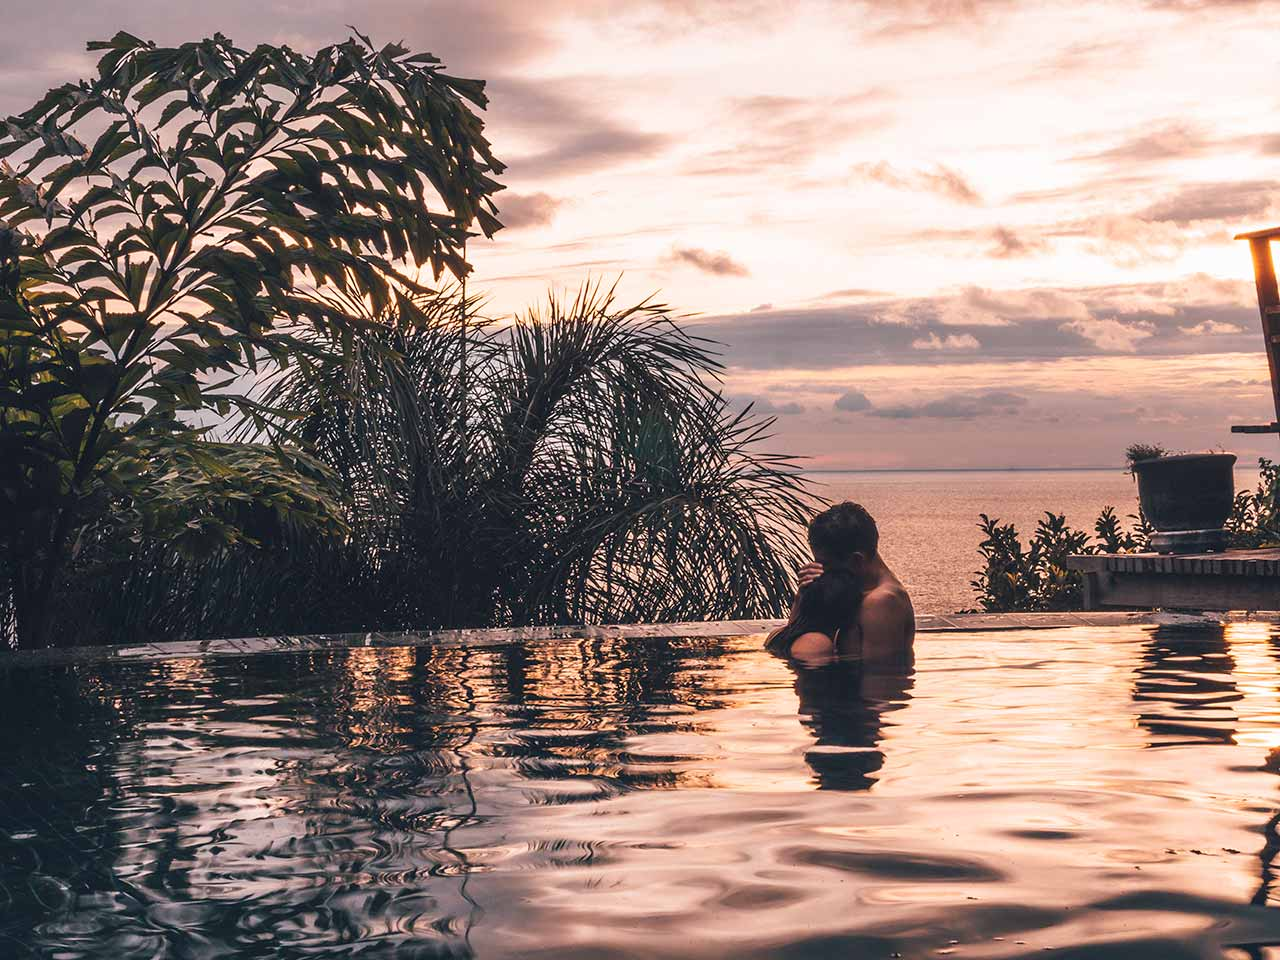 Thipwimarn Resort Koh Tao - Infinity Pool beim Sonnenuntergang